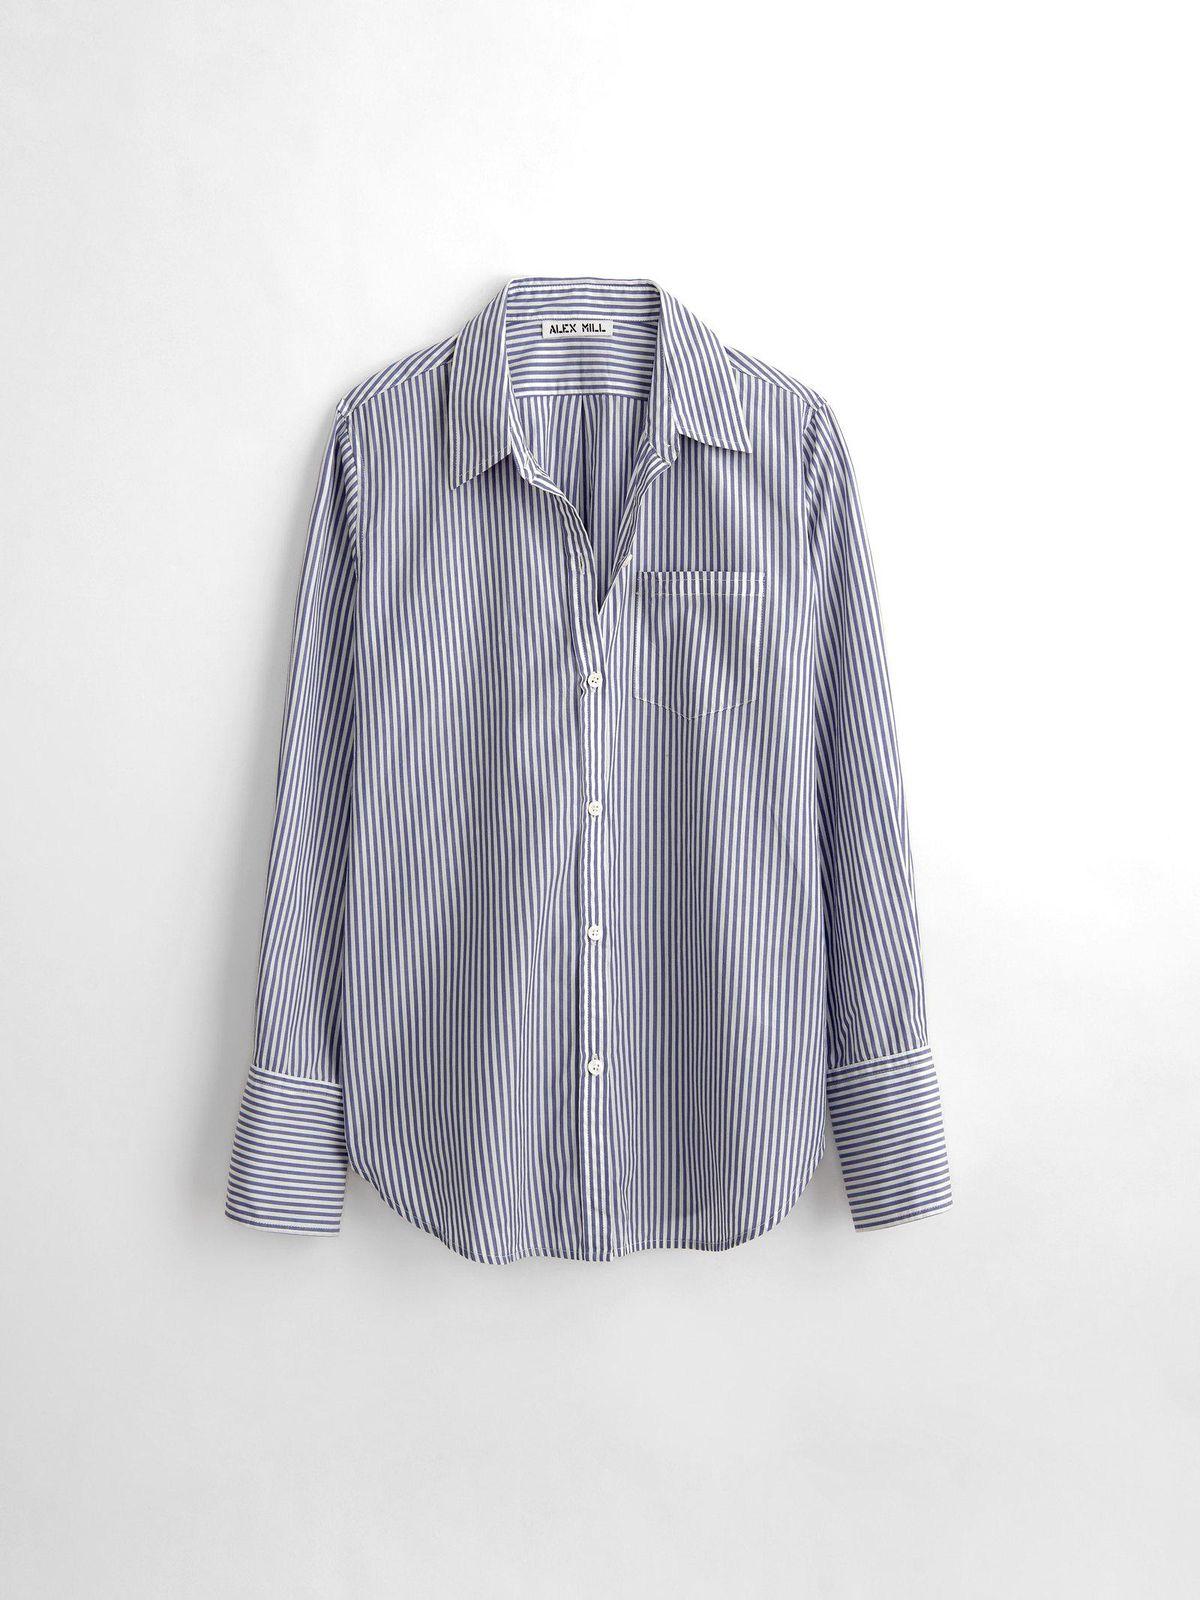 Wyatt Shirt in Bi Stripe